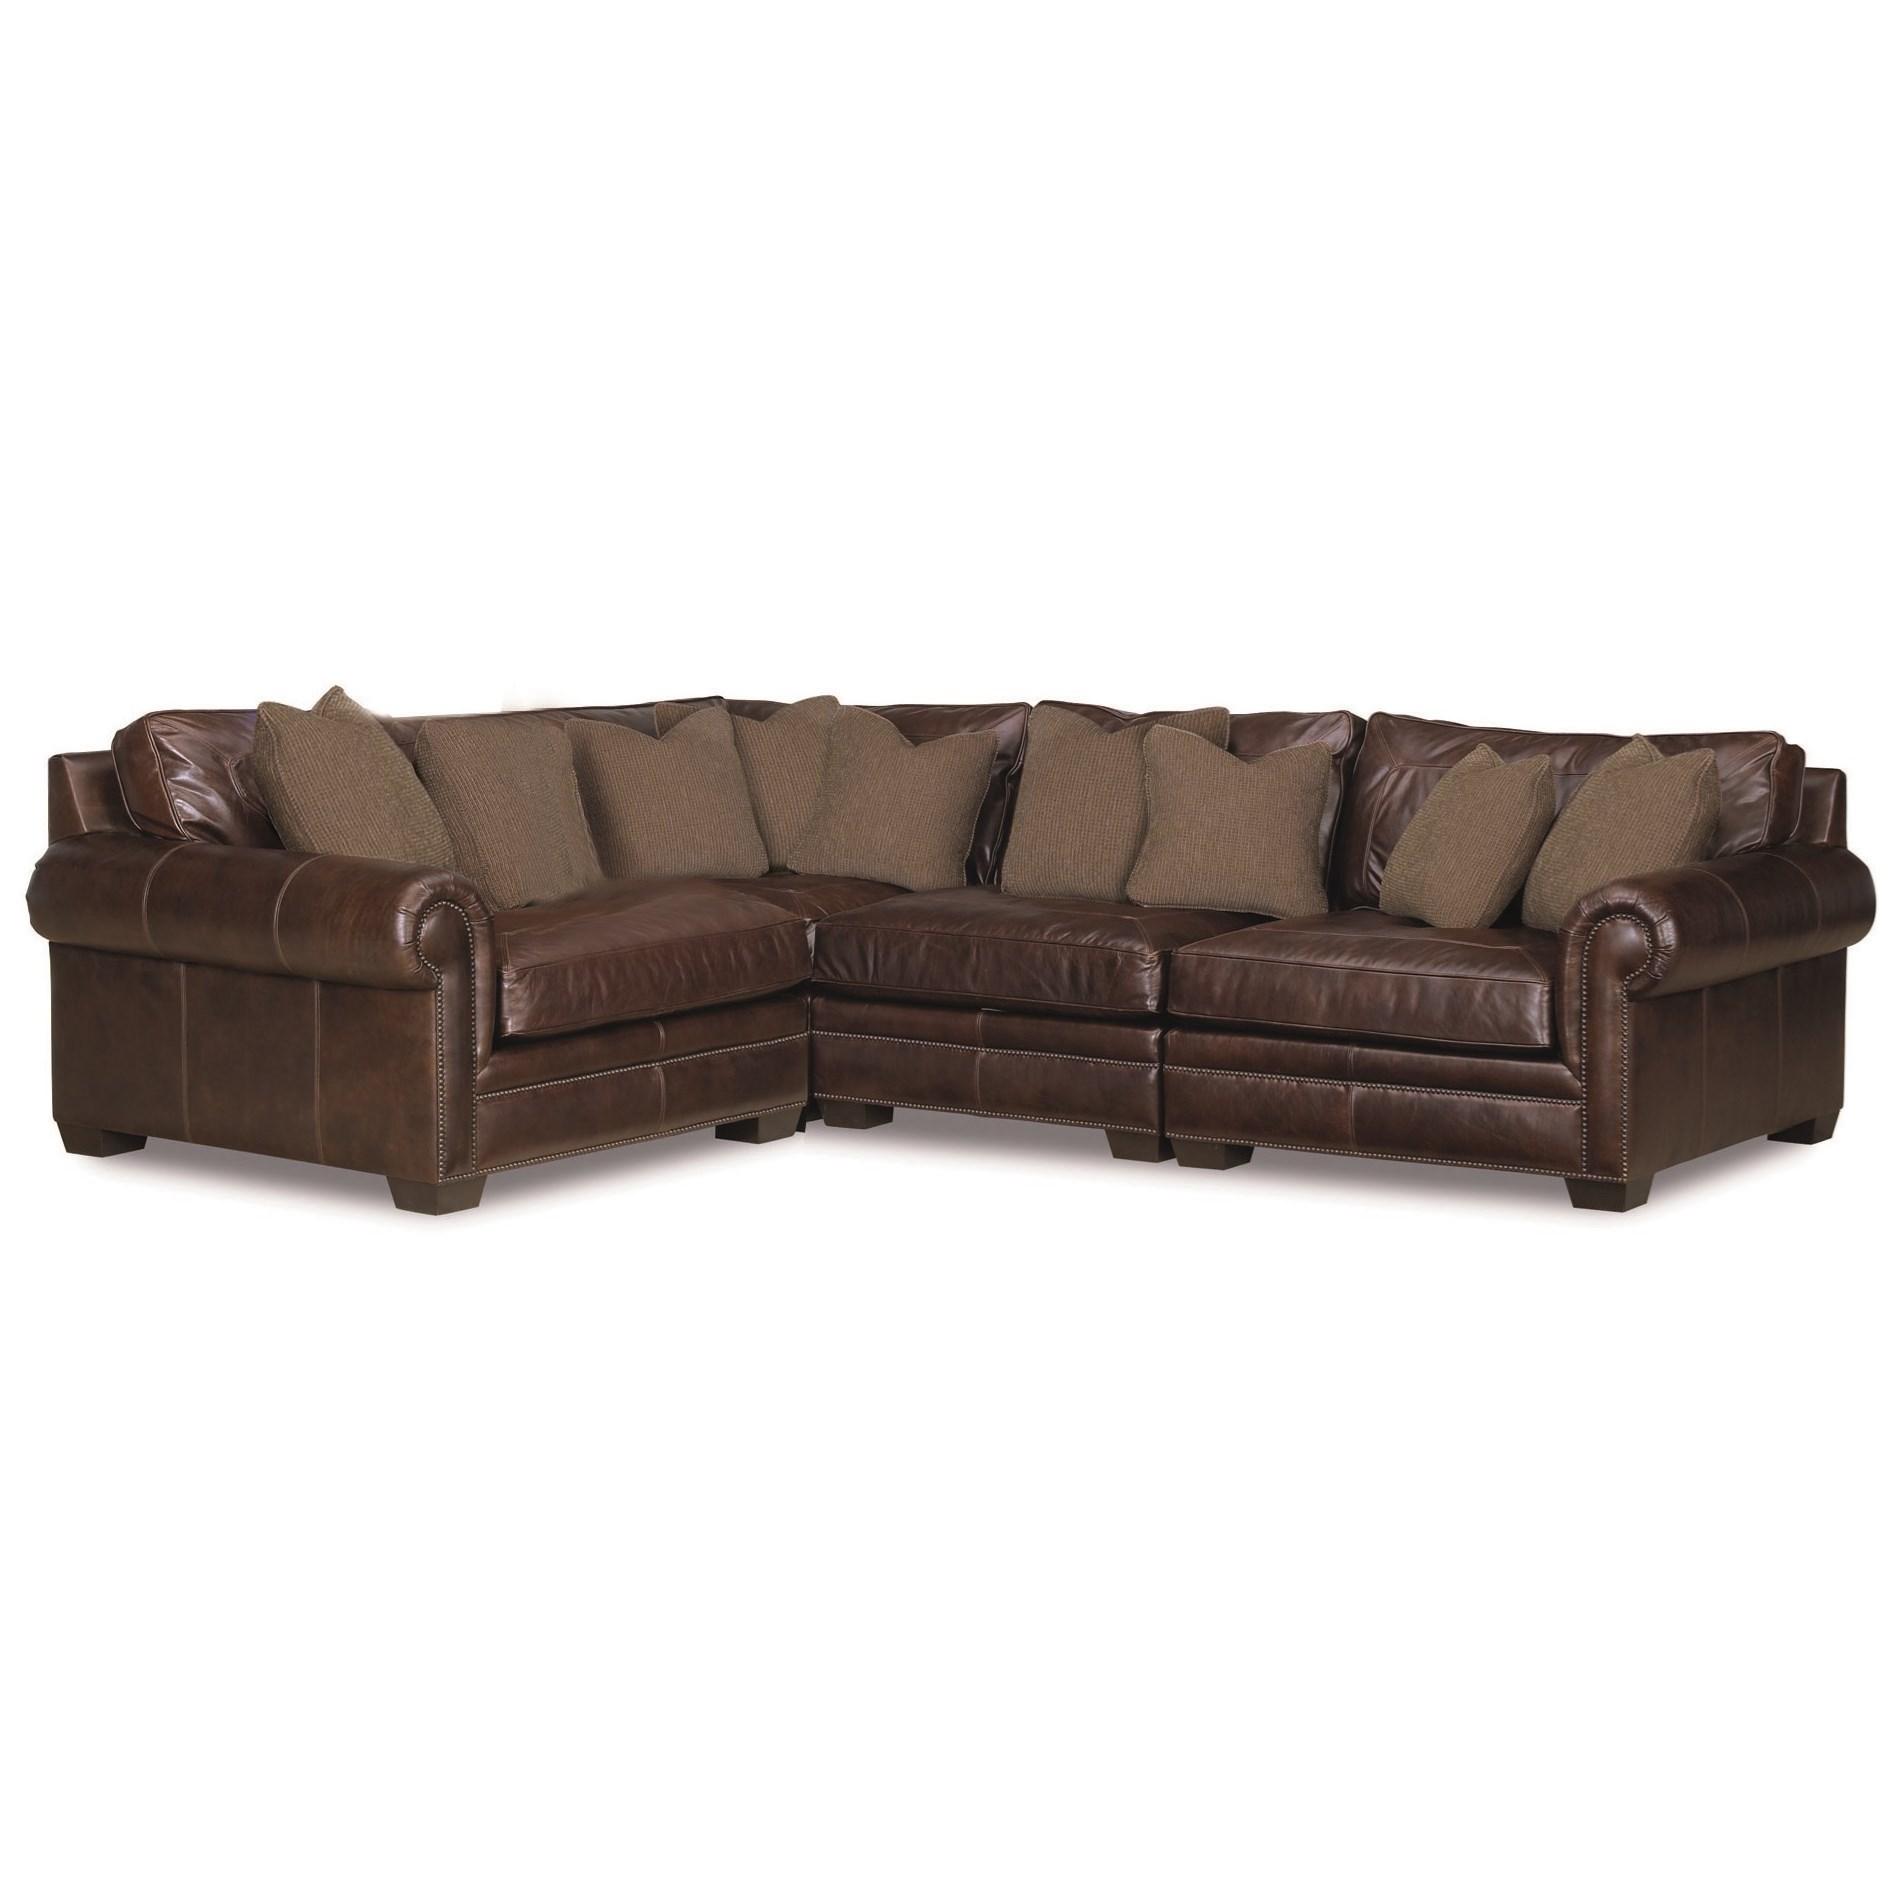 Charmant Bernhardt Grandview Four Piece Traditional Sectional Sofa